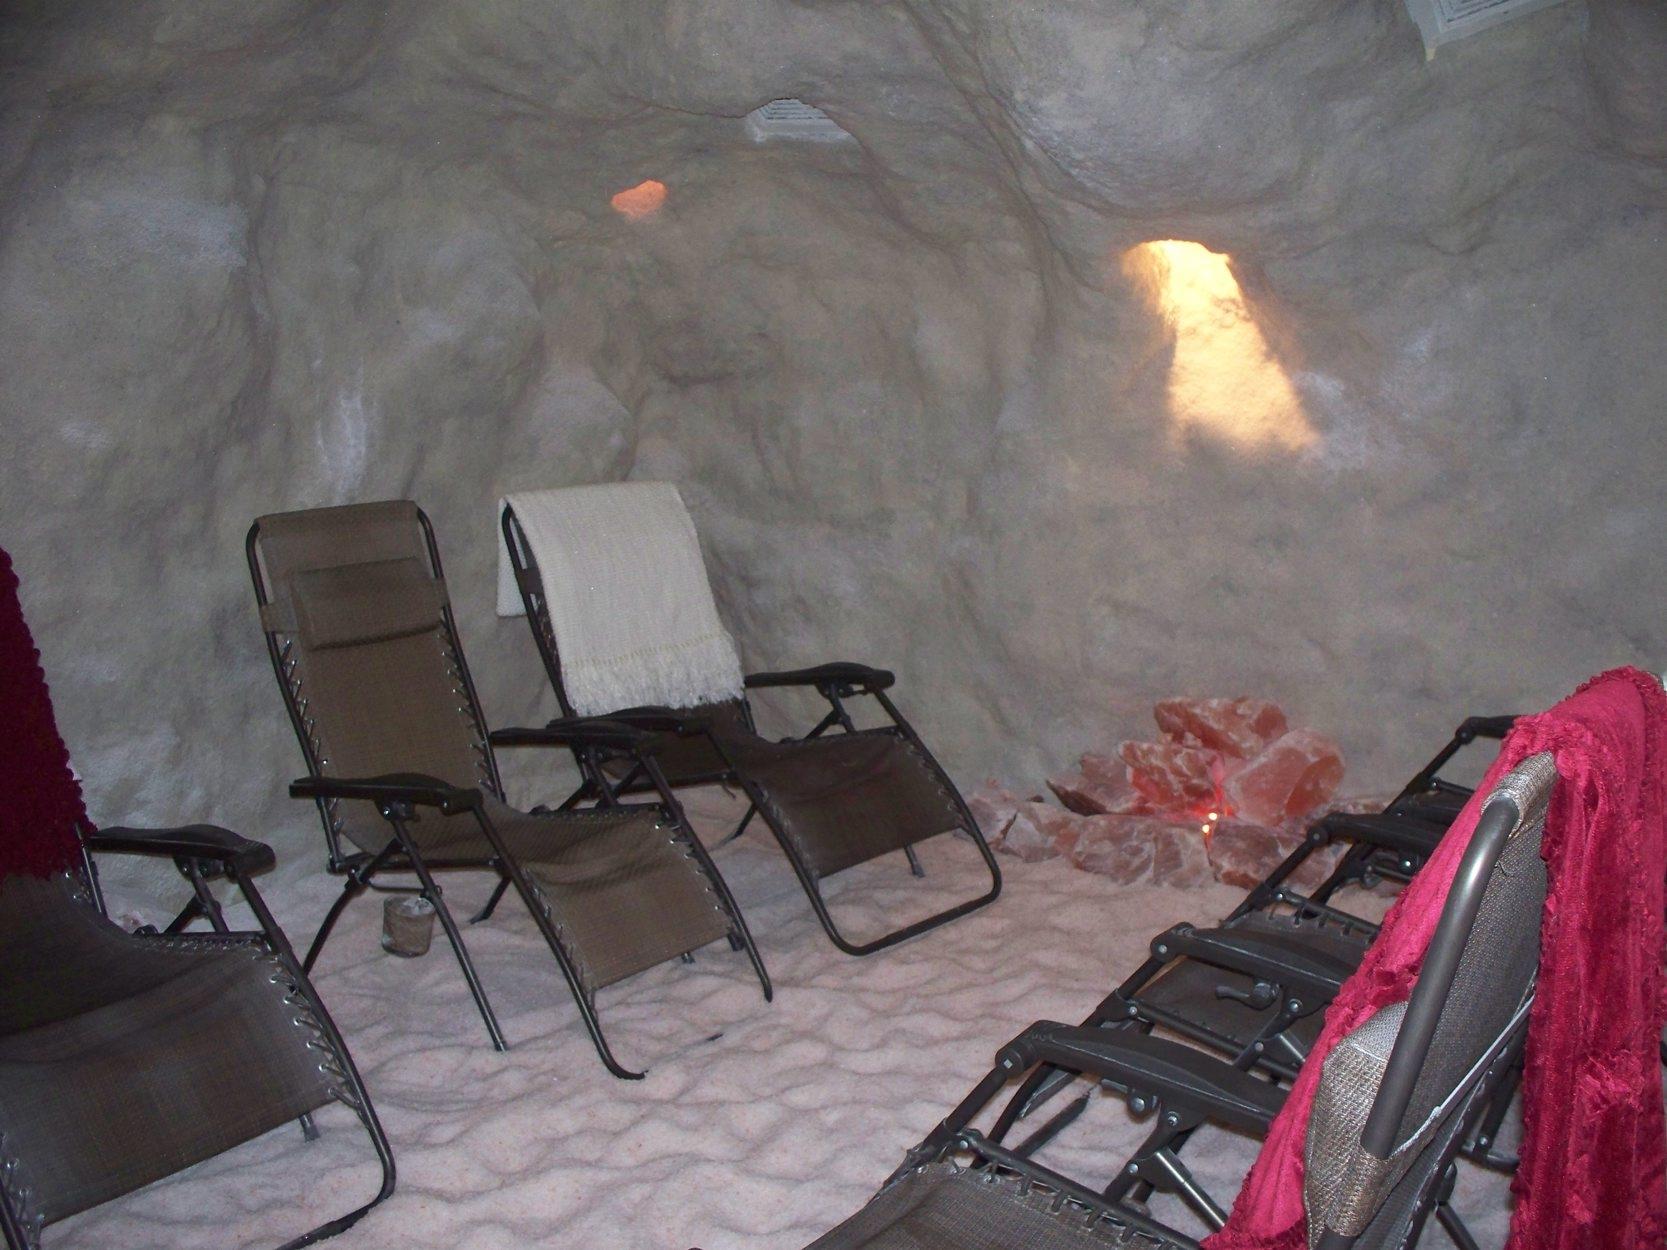 A salt cave at the Salt Sanctuary provides seating for seven.